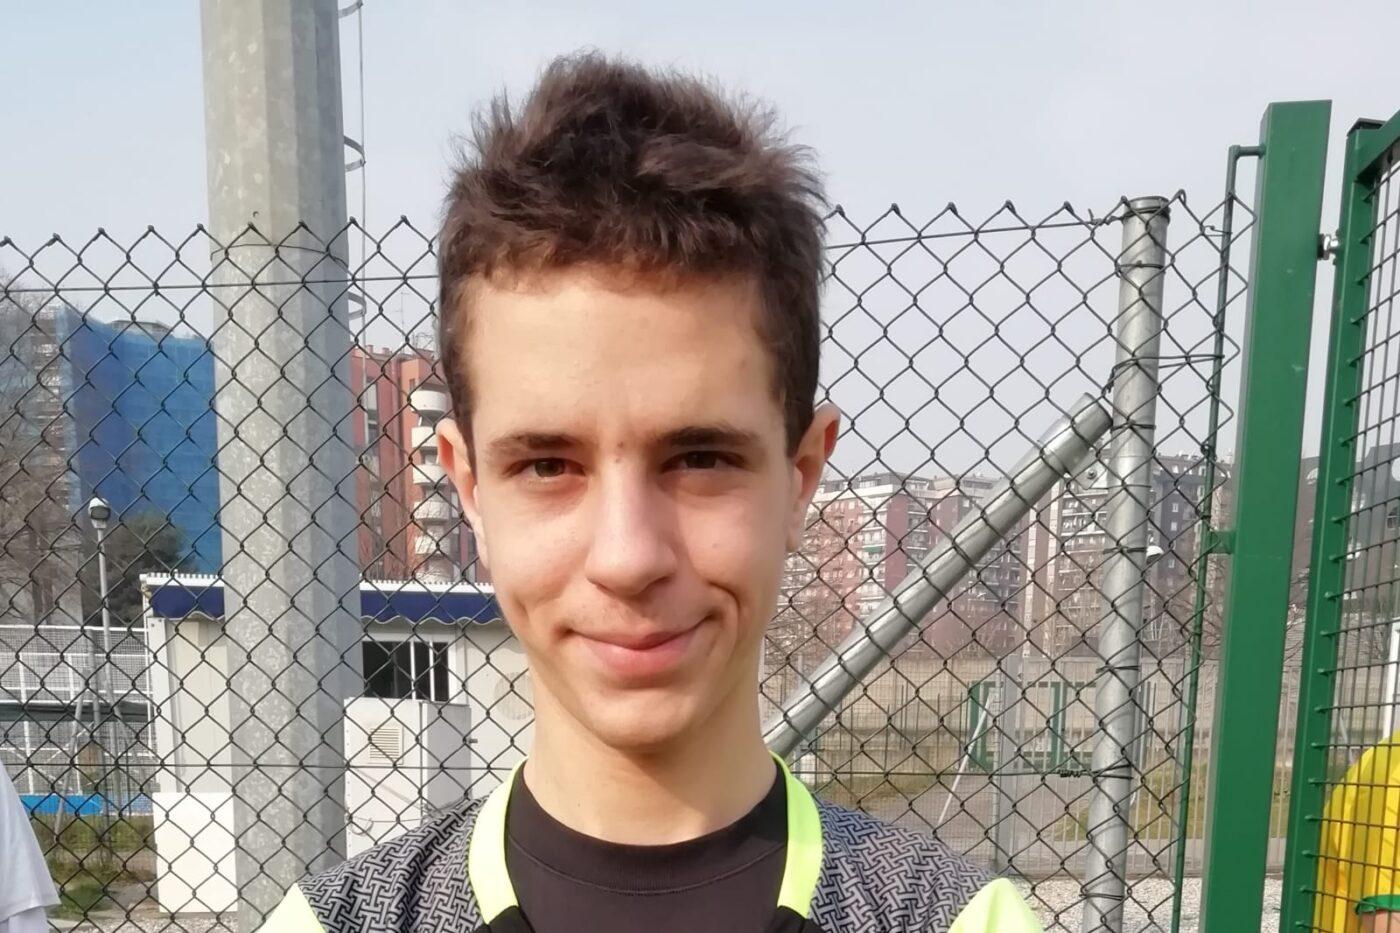 Sesto 2012 - Orpas Under 17: Federico Emanuele di Cinisello Balsamo